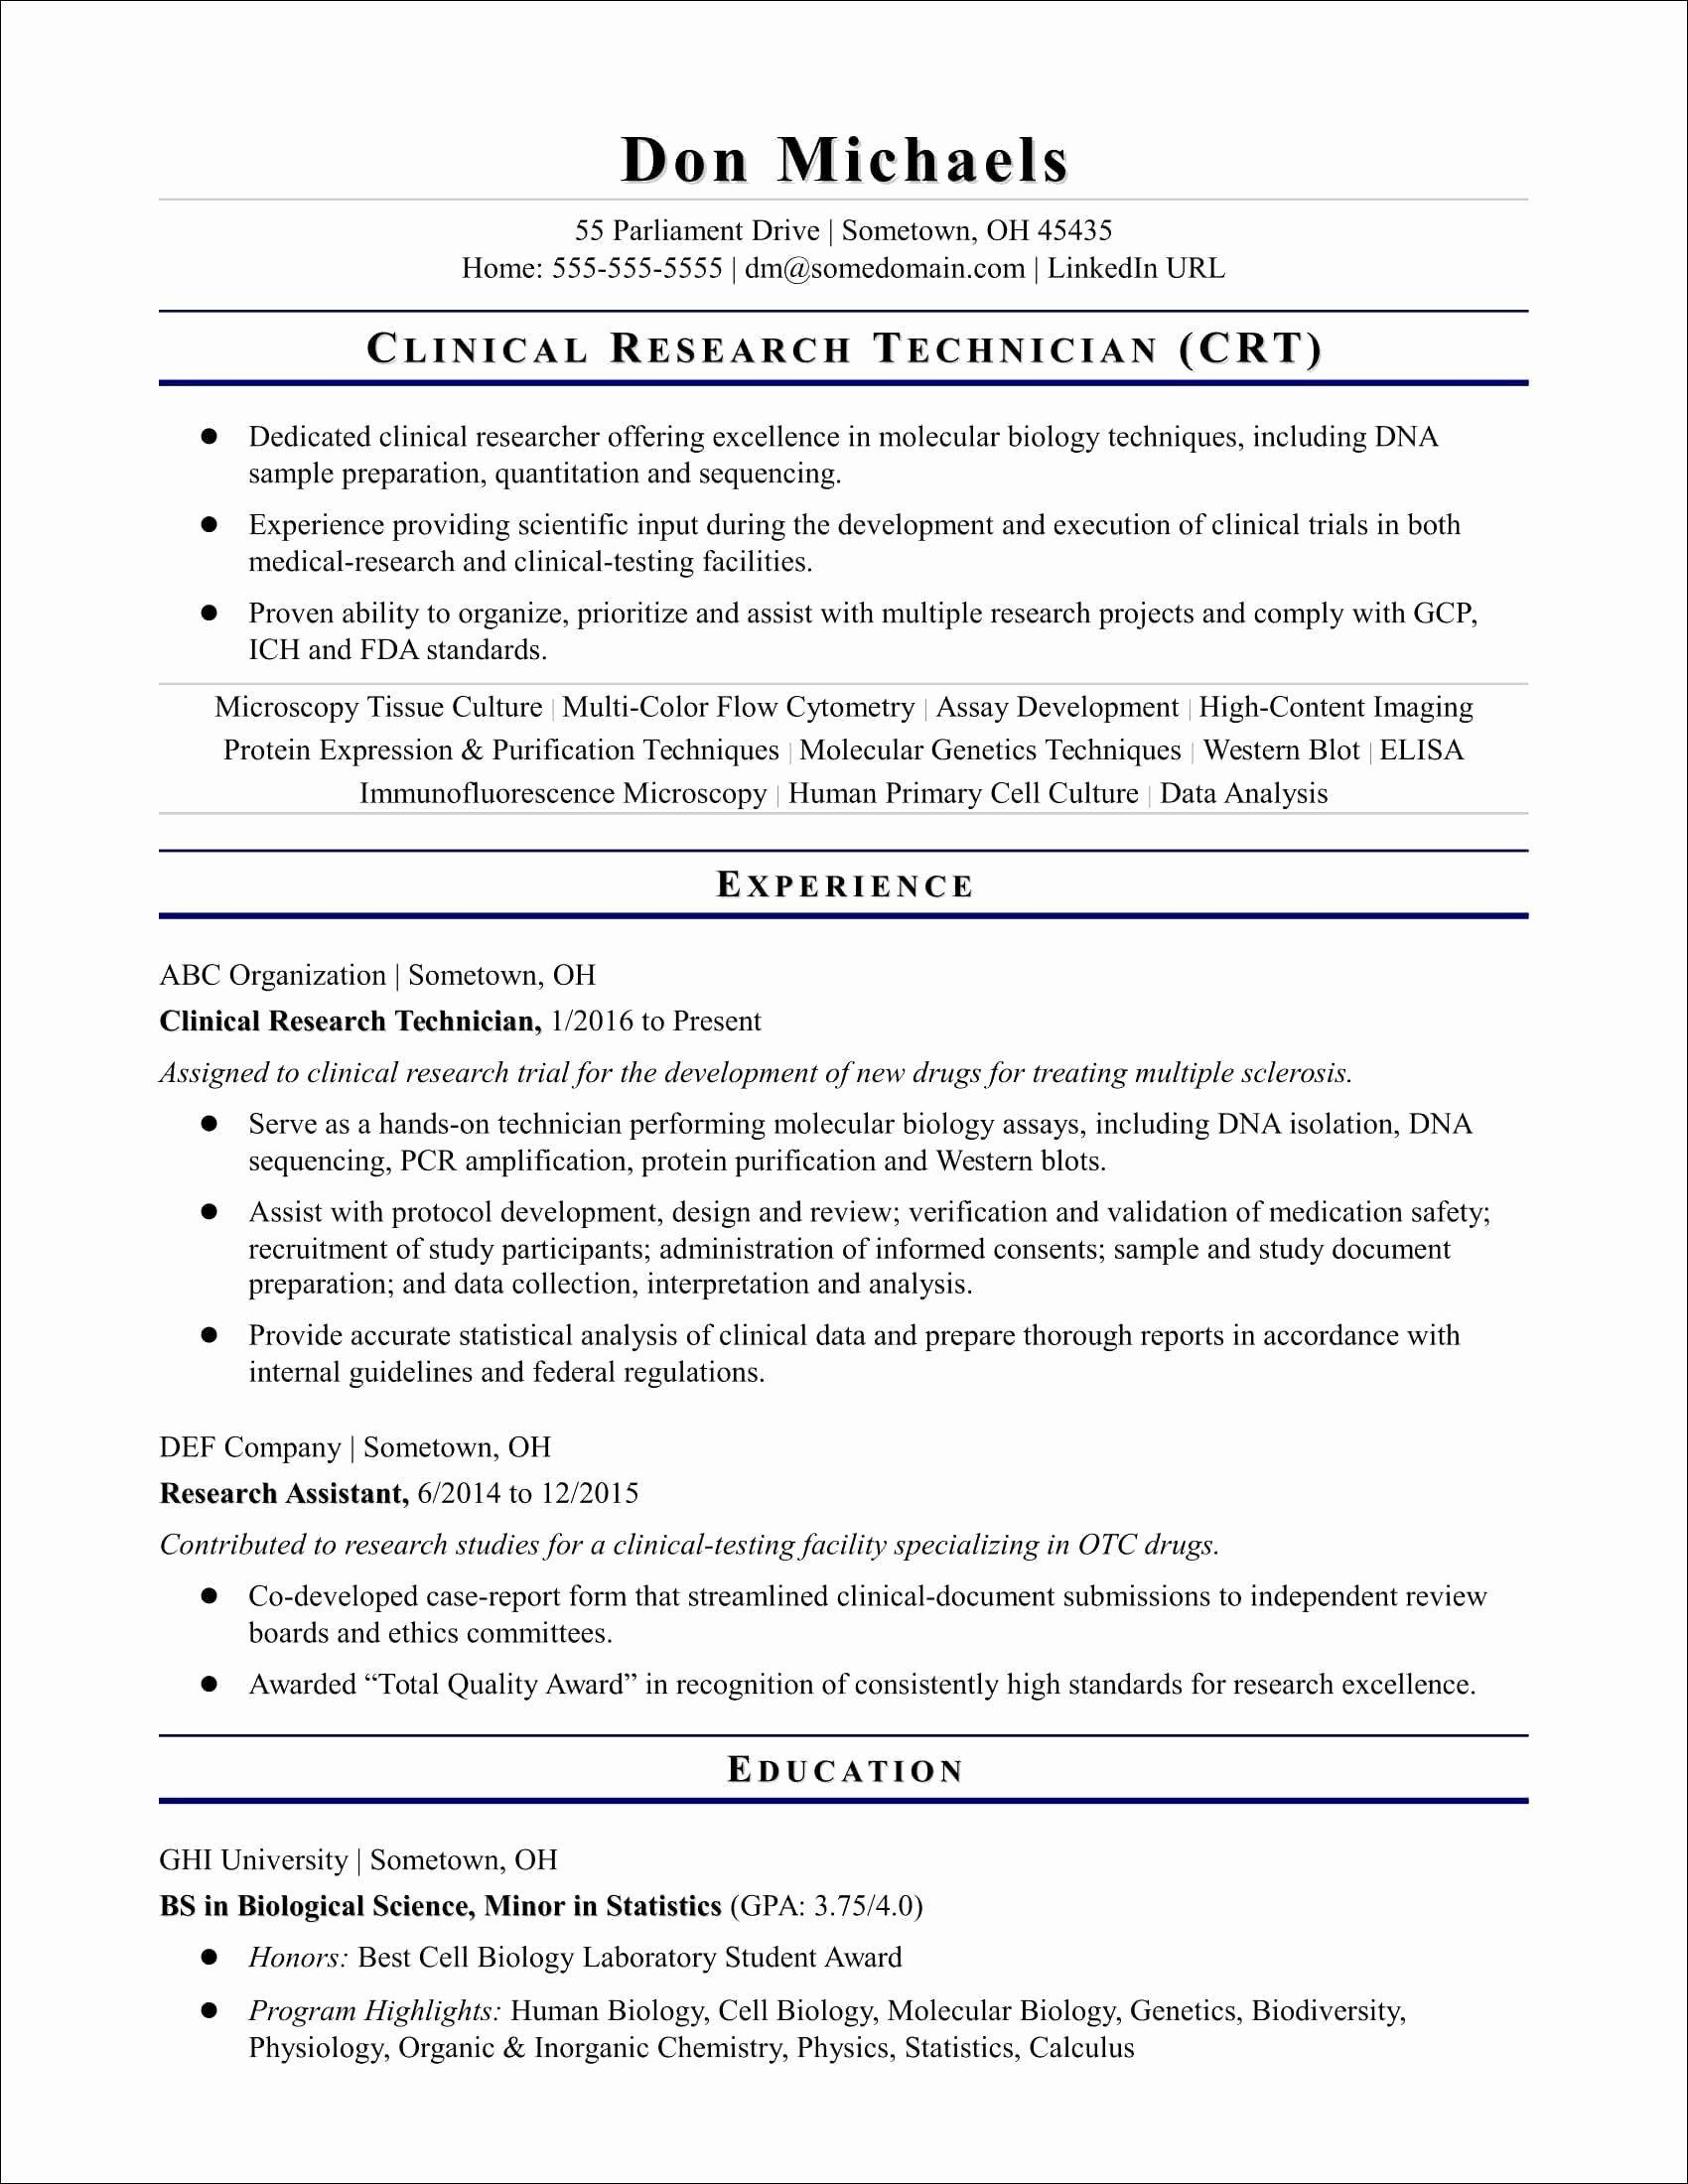 Clinical Research Coordinator Resume Elegant 10 Clinical Research Coordinator Resume Biology Labs Resume Skills Student Resume